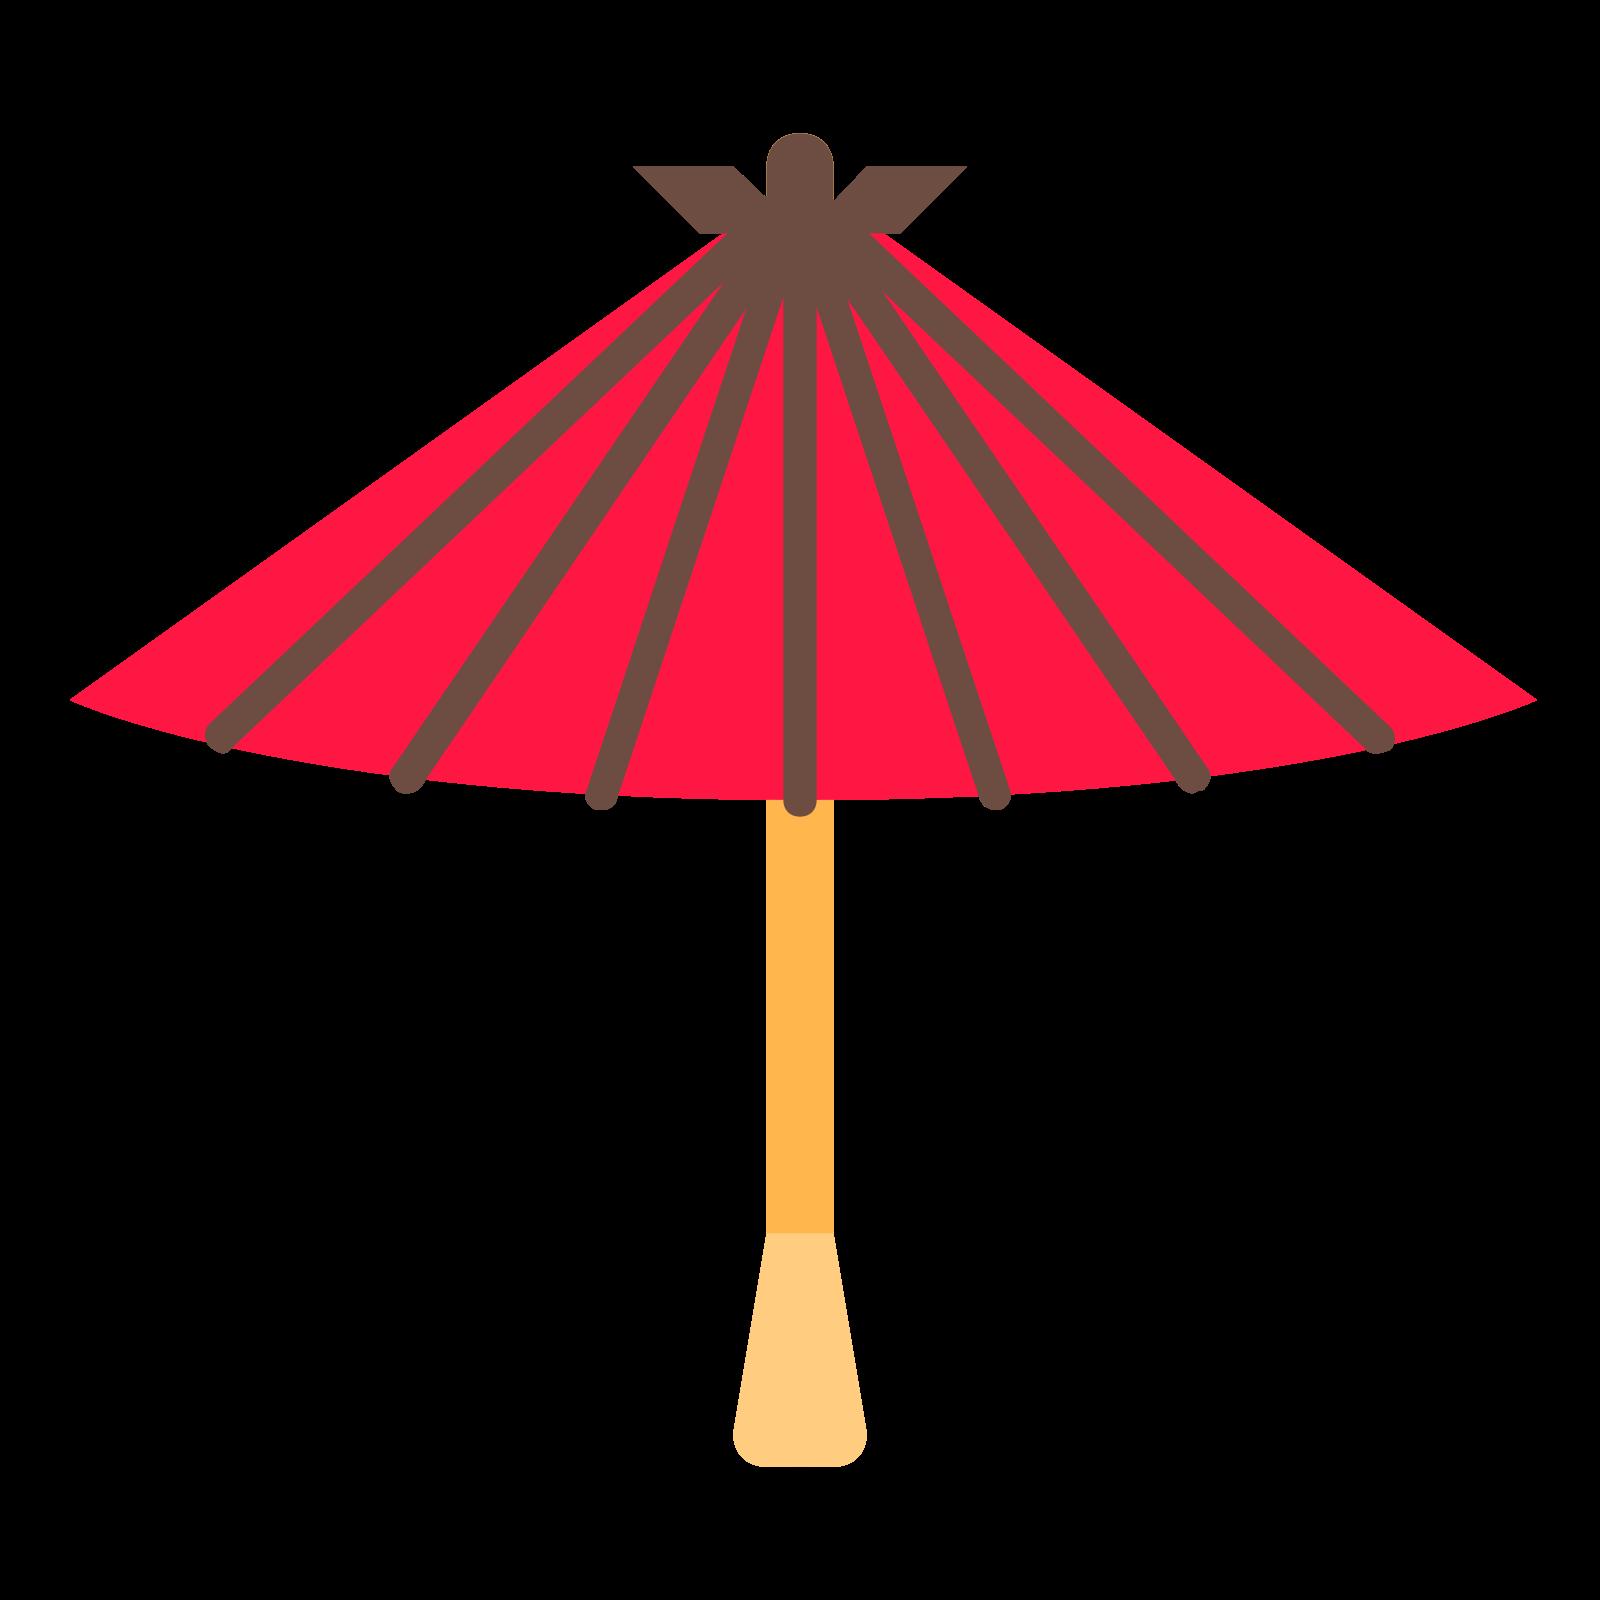 Japanese Umbrella icon